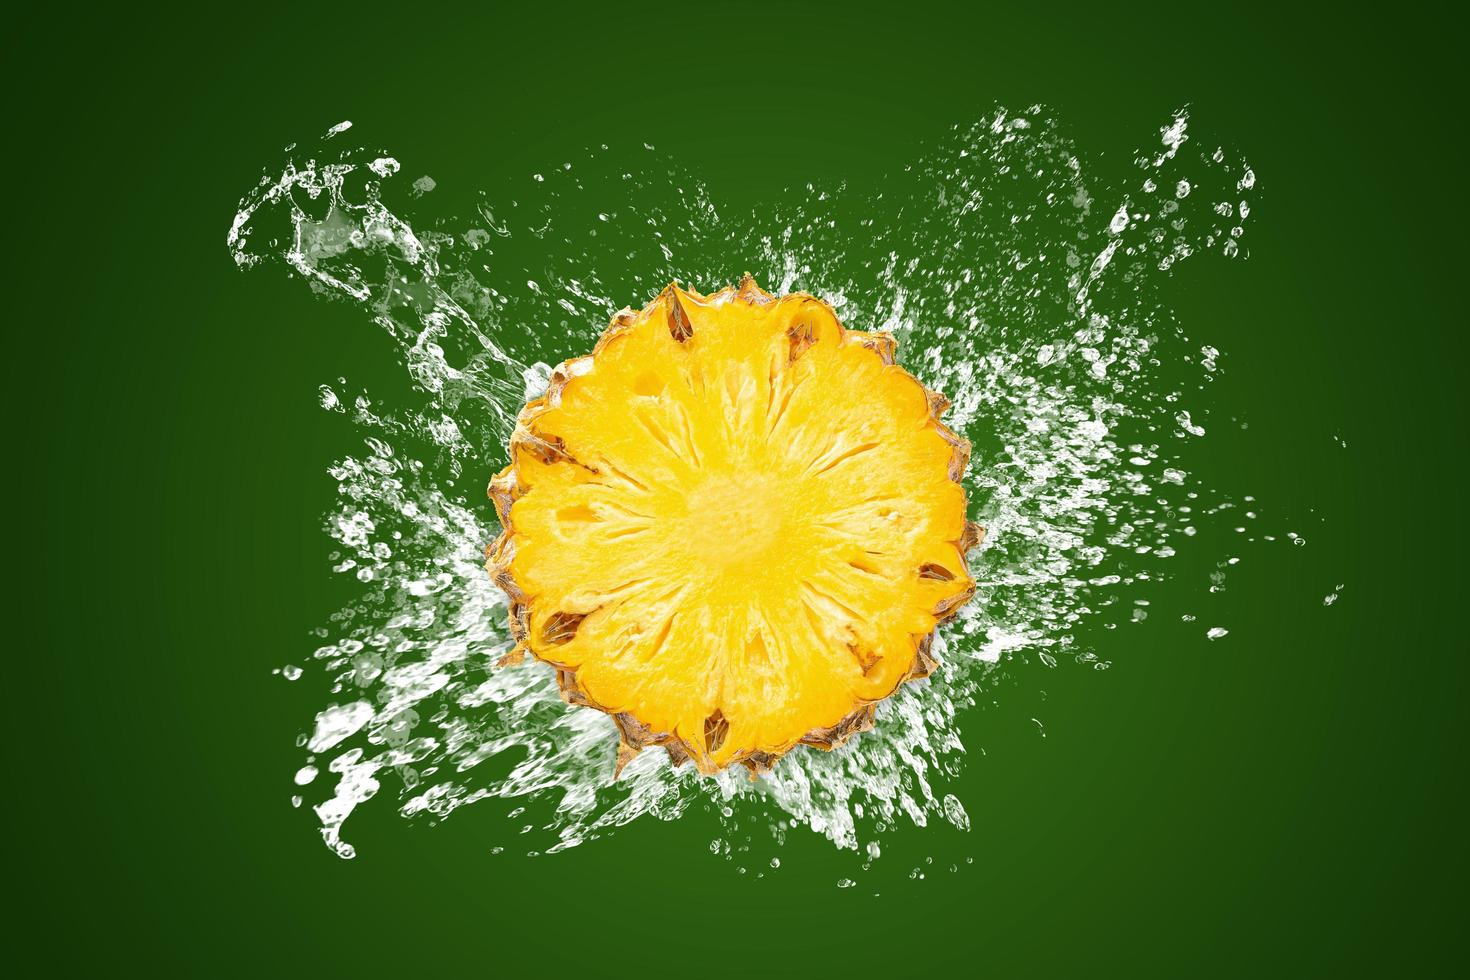 Water splashing on sliced pineapple  photo